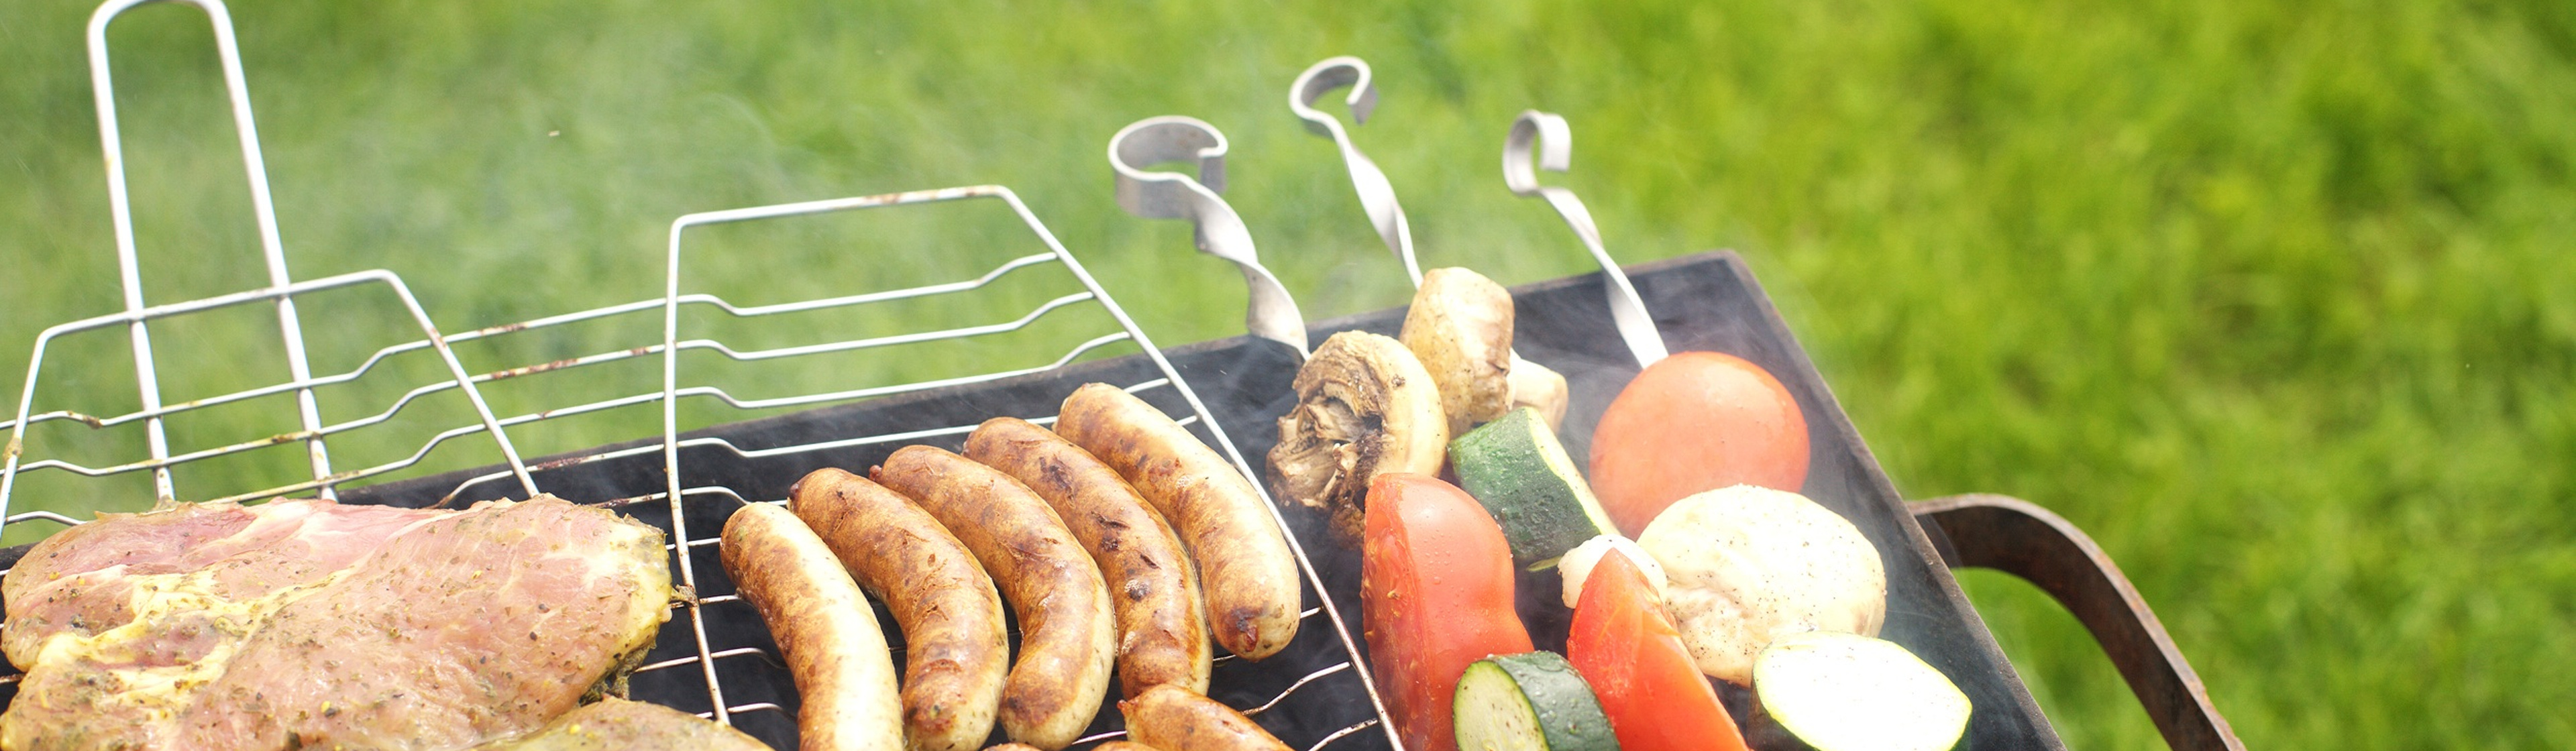 Tasty Treats: Sizzling BBQ Inspiration